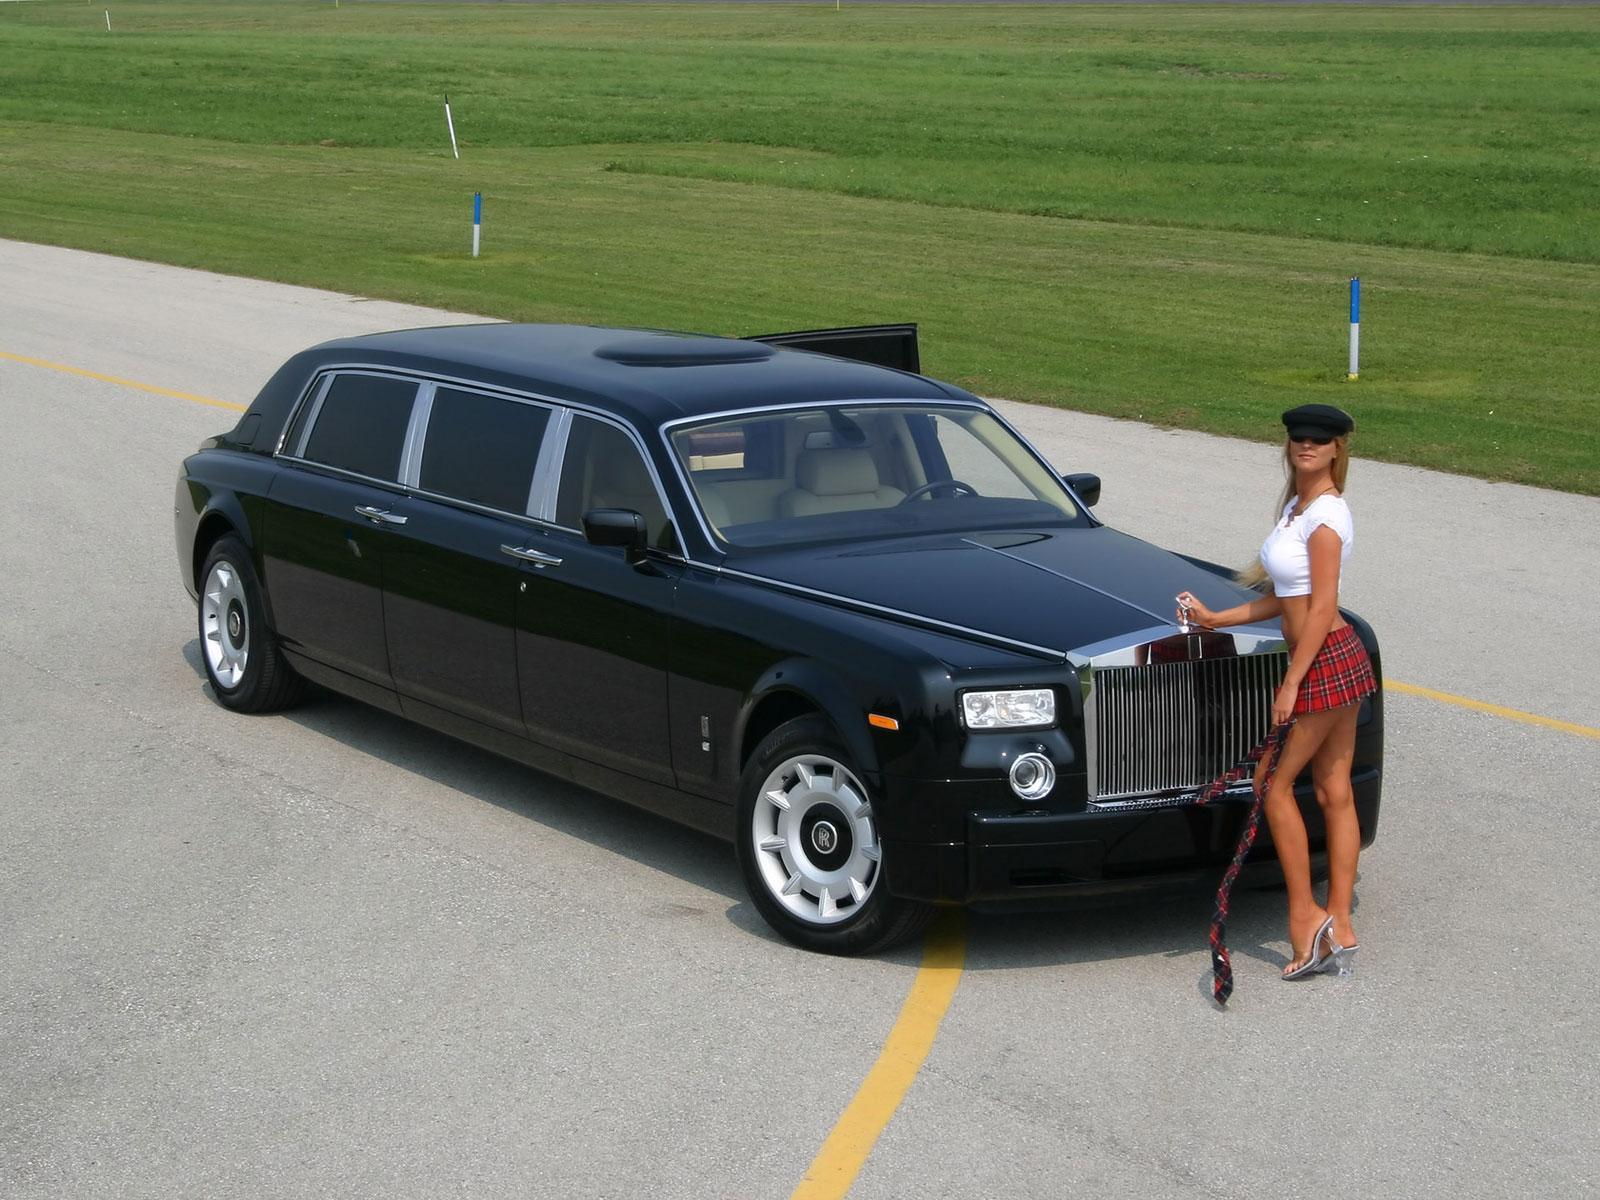 CarsWallpapersRolls Royce Phantom Cars Wallpapers Rolls